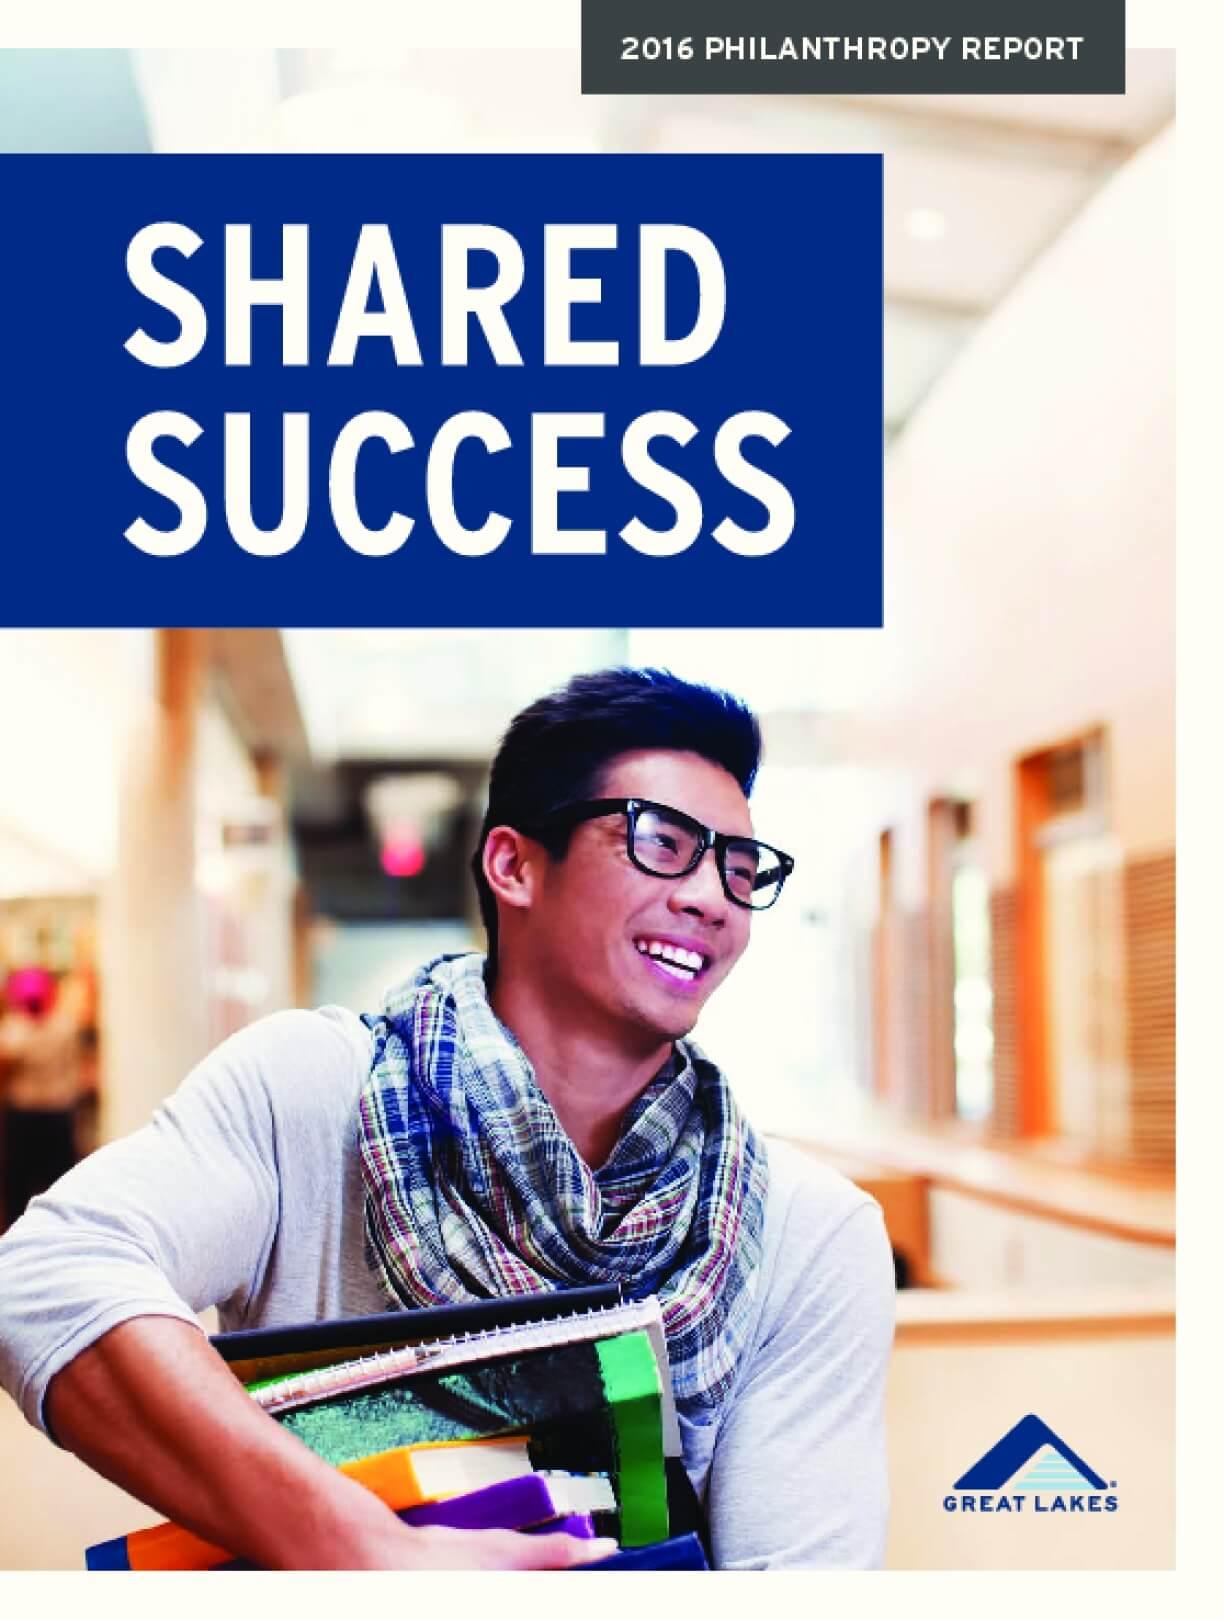 2016 Philanthropy Report: Shared Success